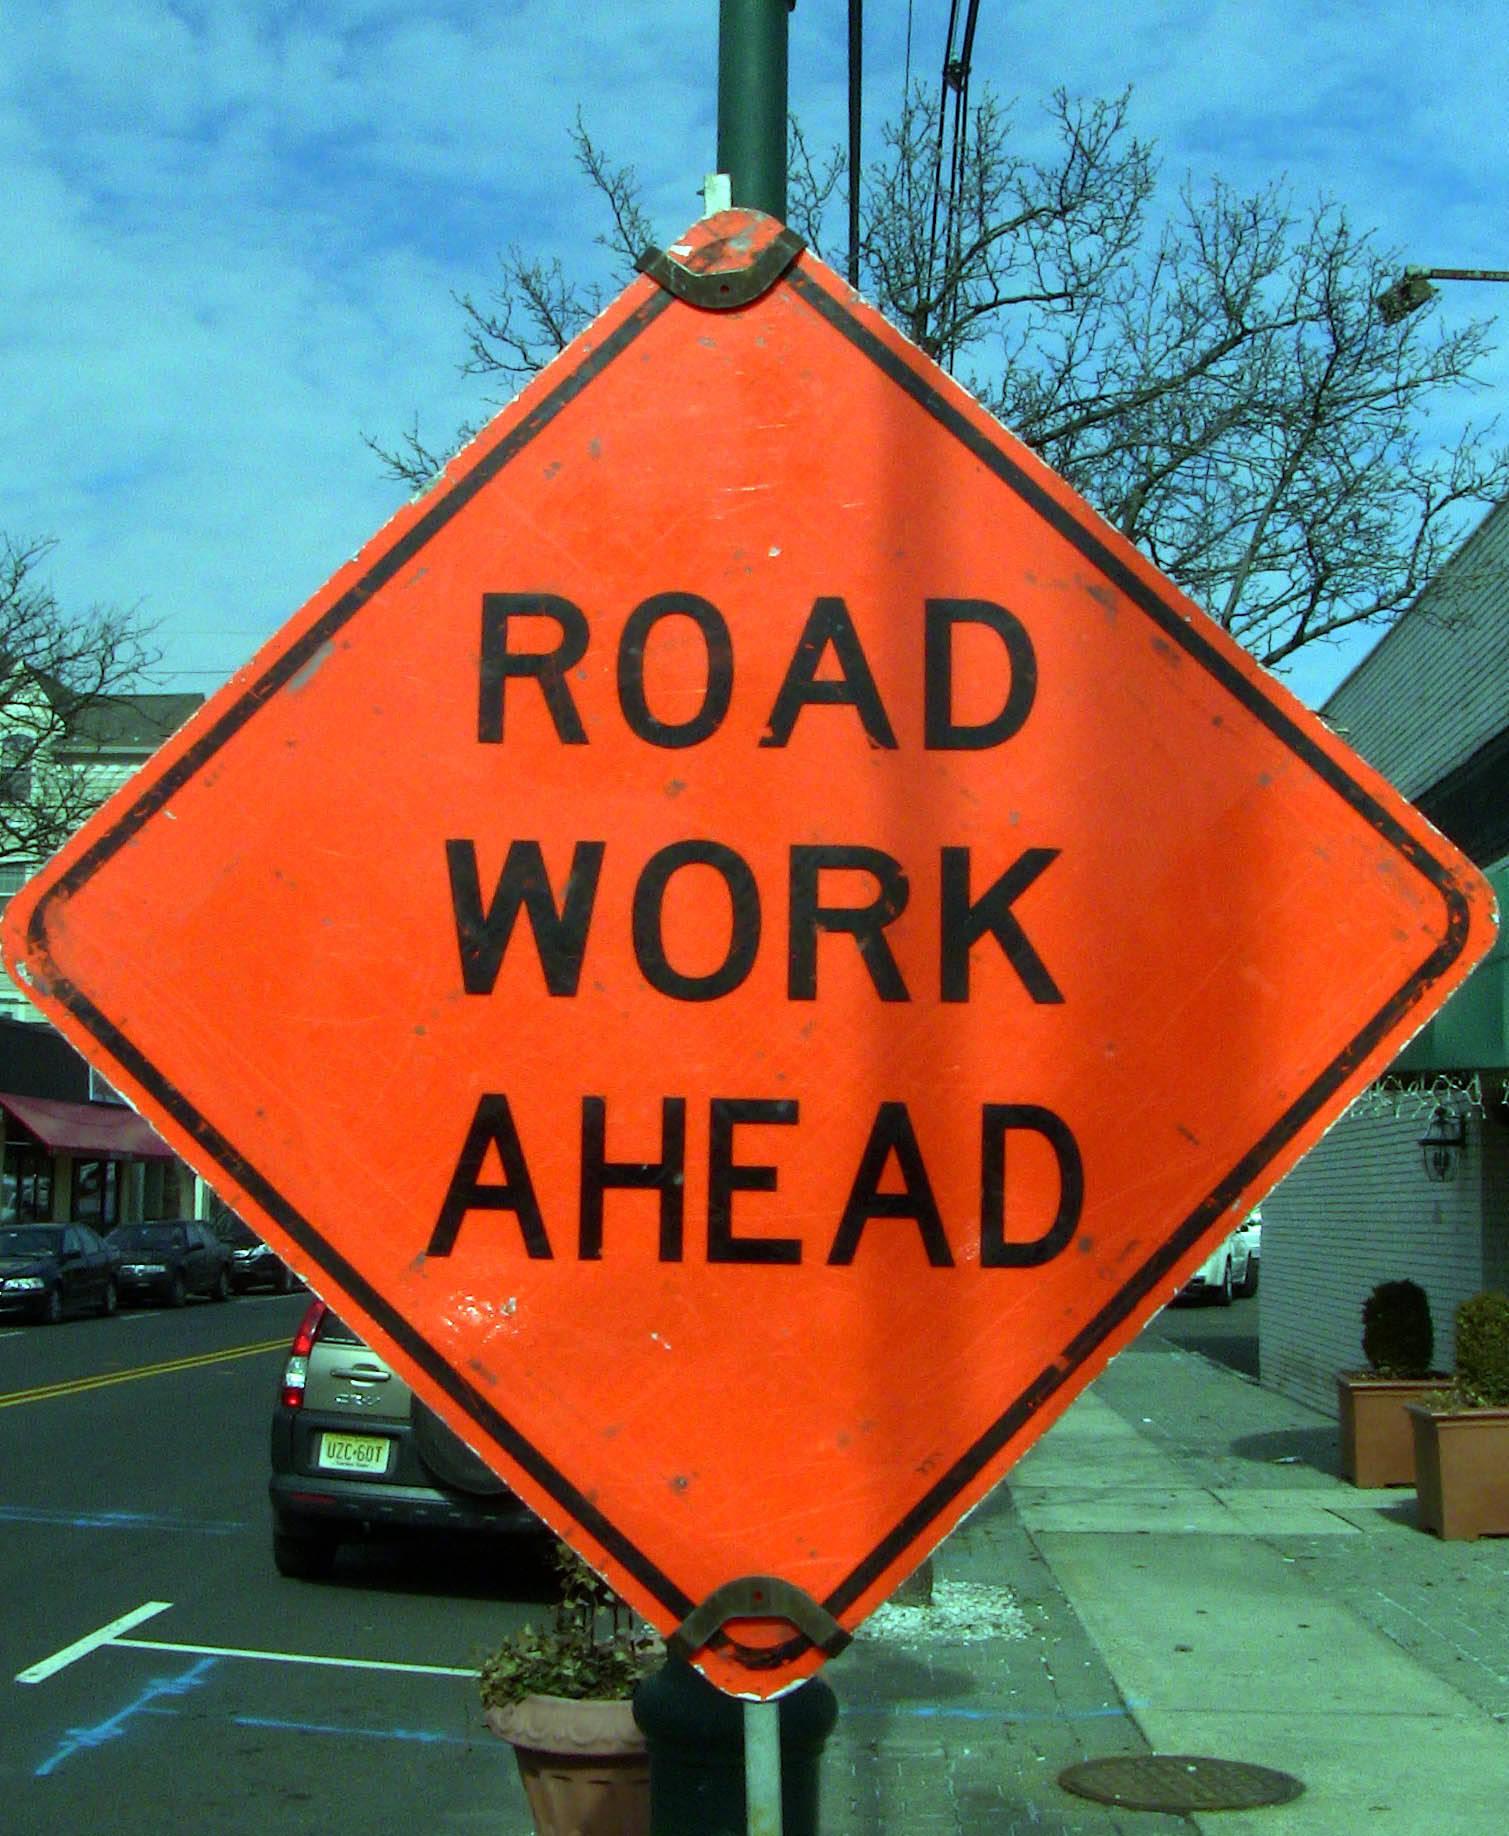 672f175a235cd7f744b8_583c141af46d2d8a5fa1_Road_Work_Ahead_sign.jpg